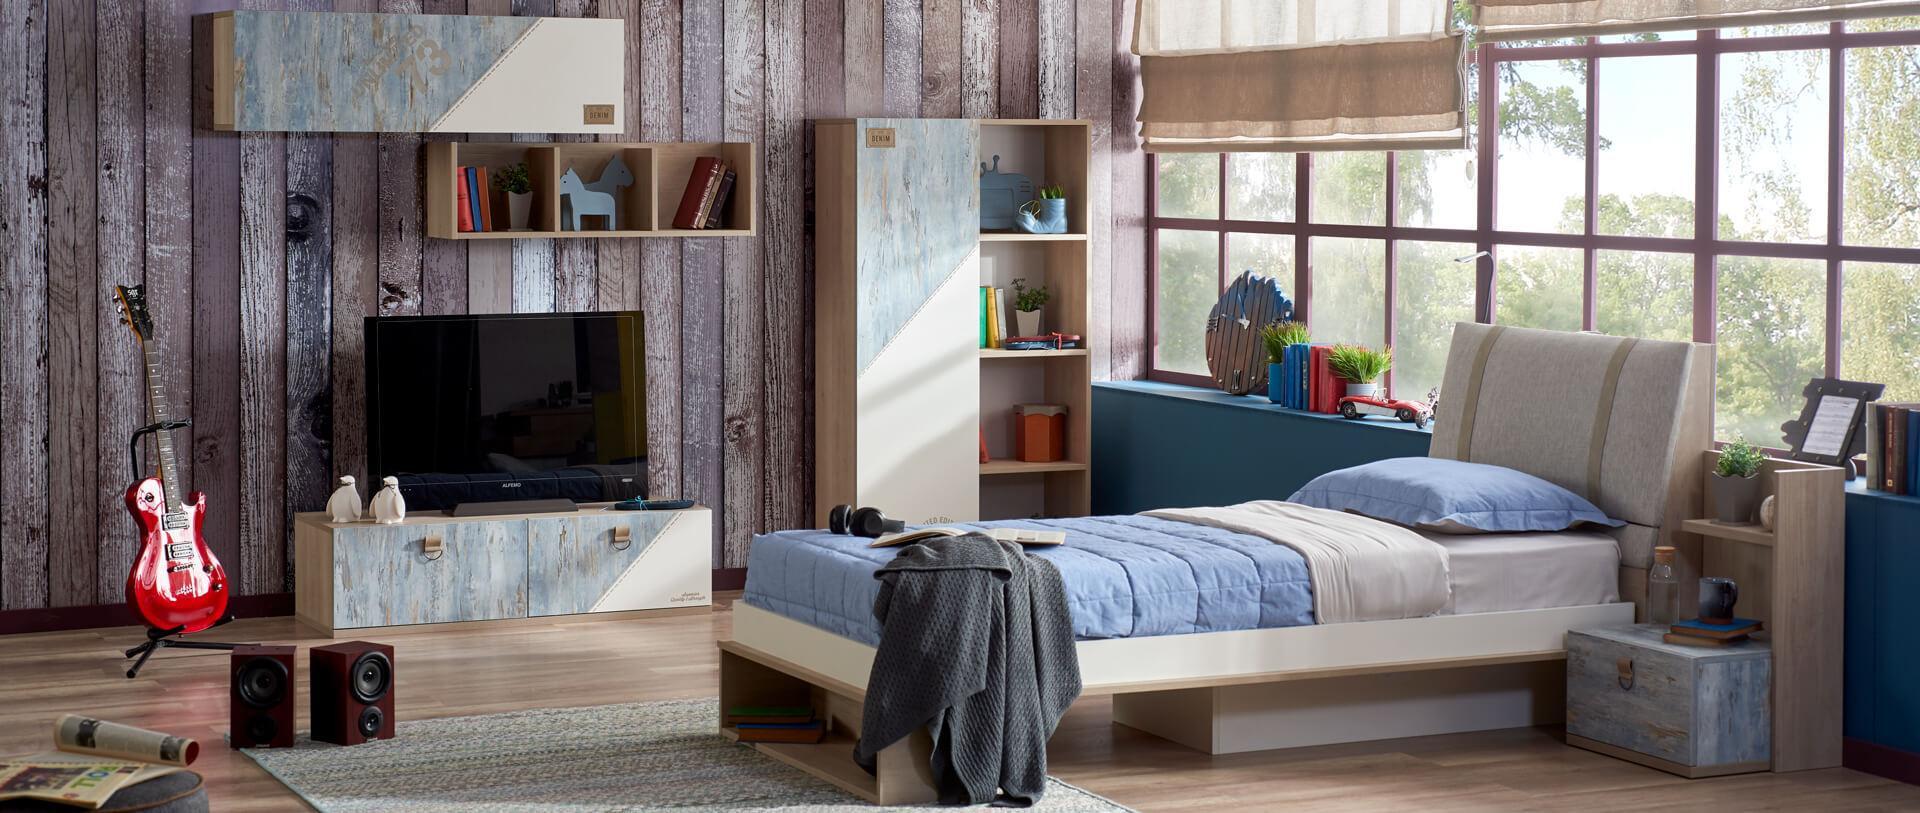 ALFEMO KIDS&TEENS DENIM YOUNG ROOM